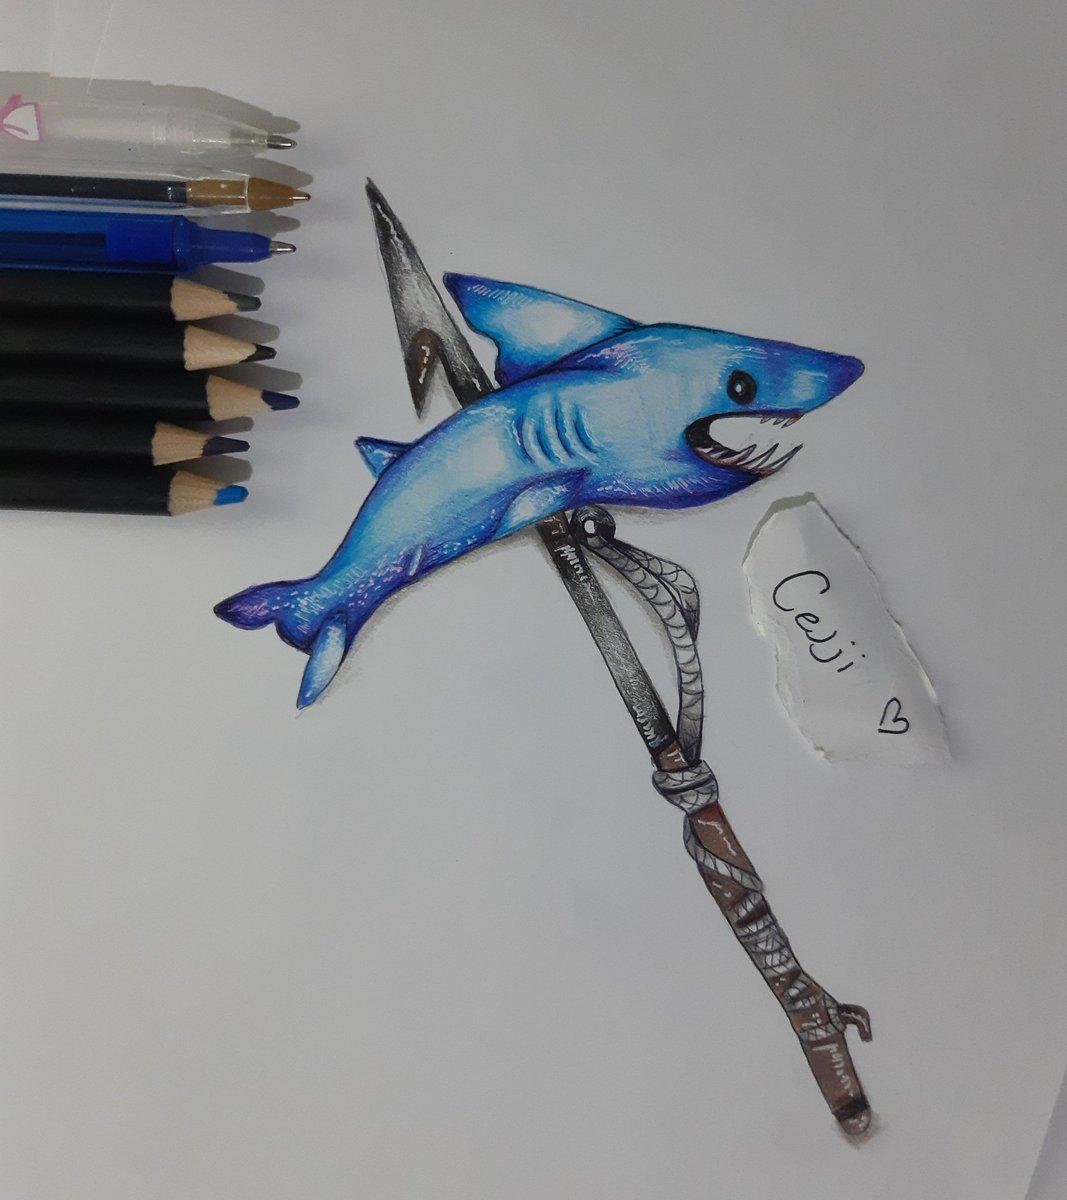 chomp jr pickaxe drawing fortnitegame fortnite fortnitefanart fortnitesketch - shark pickaxe fortnite